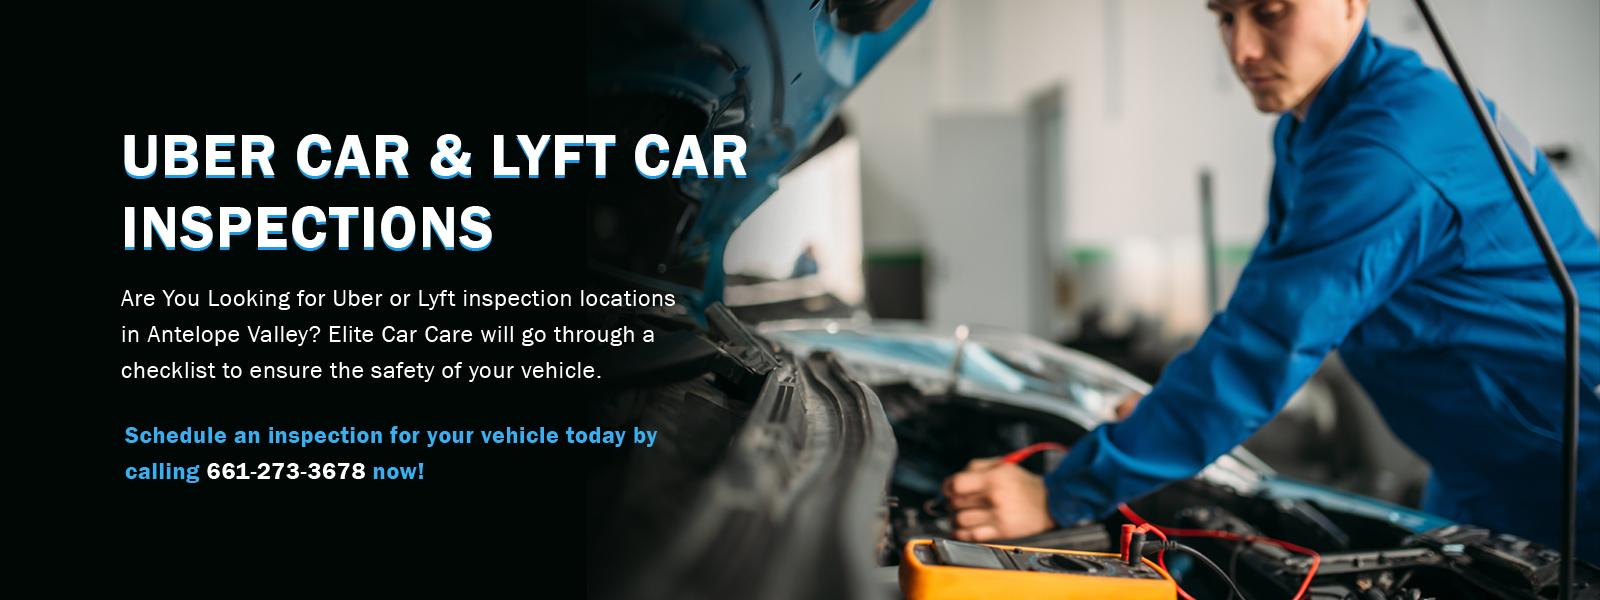 uber car inspection palmdale